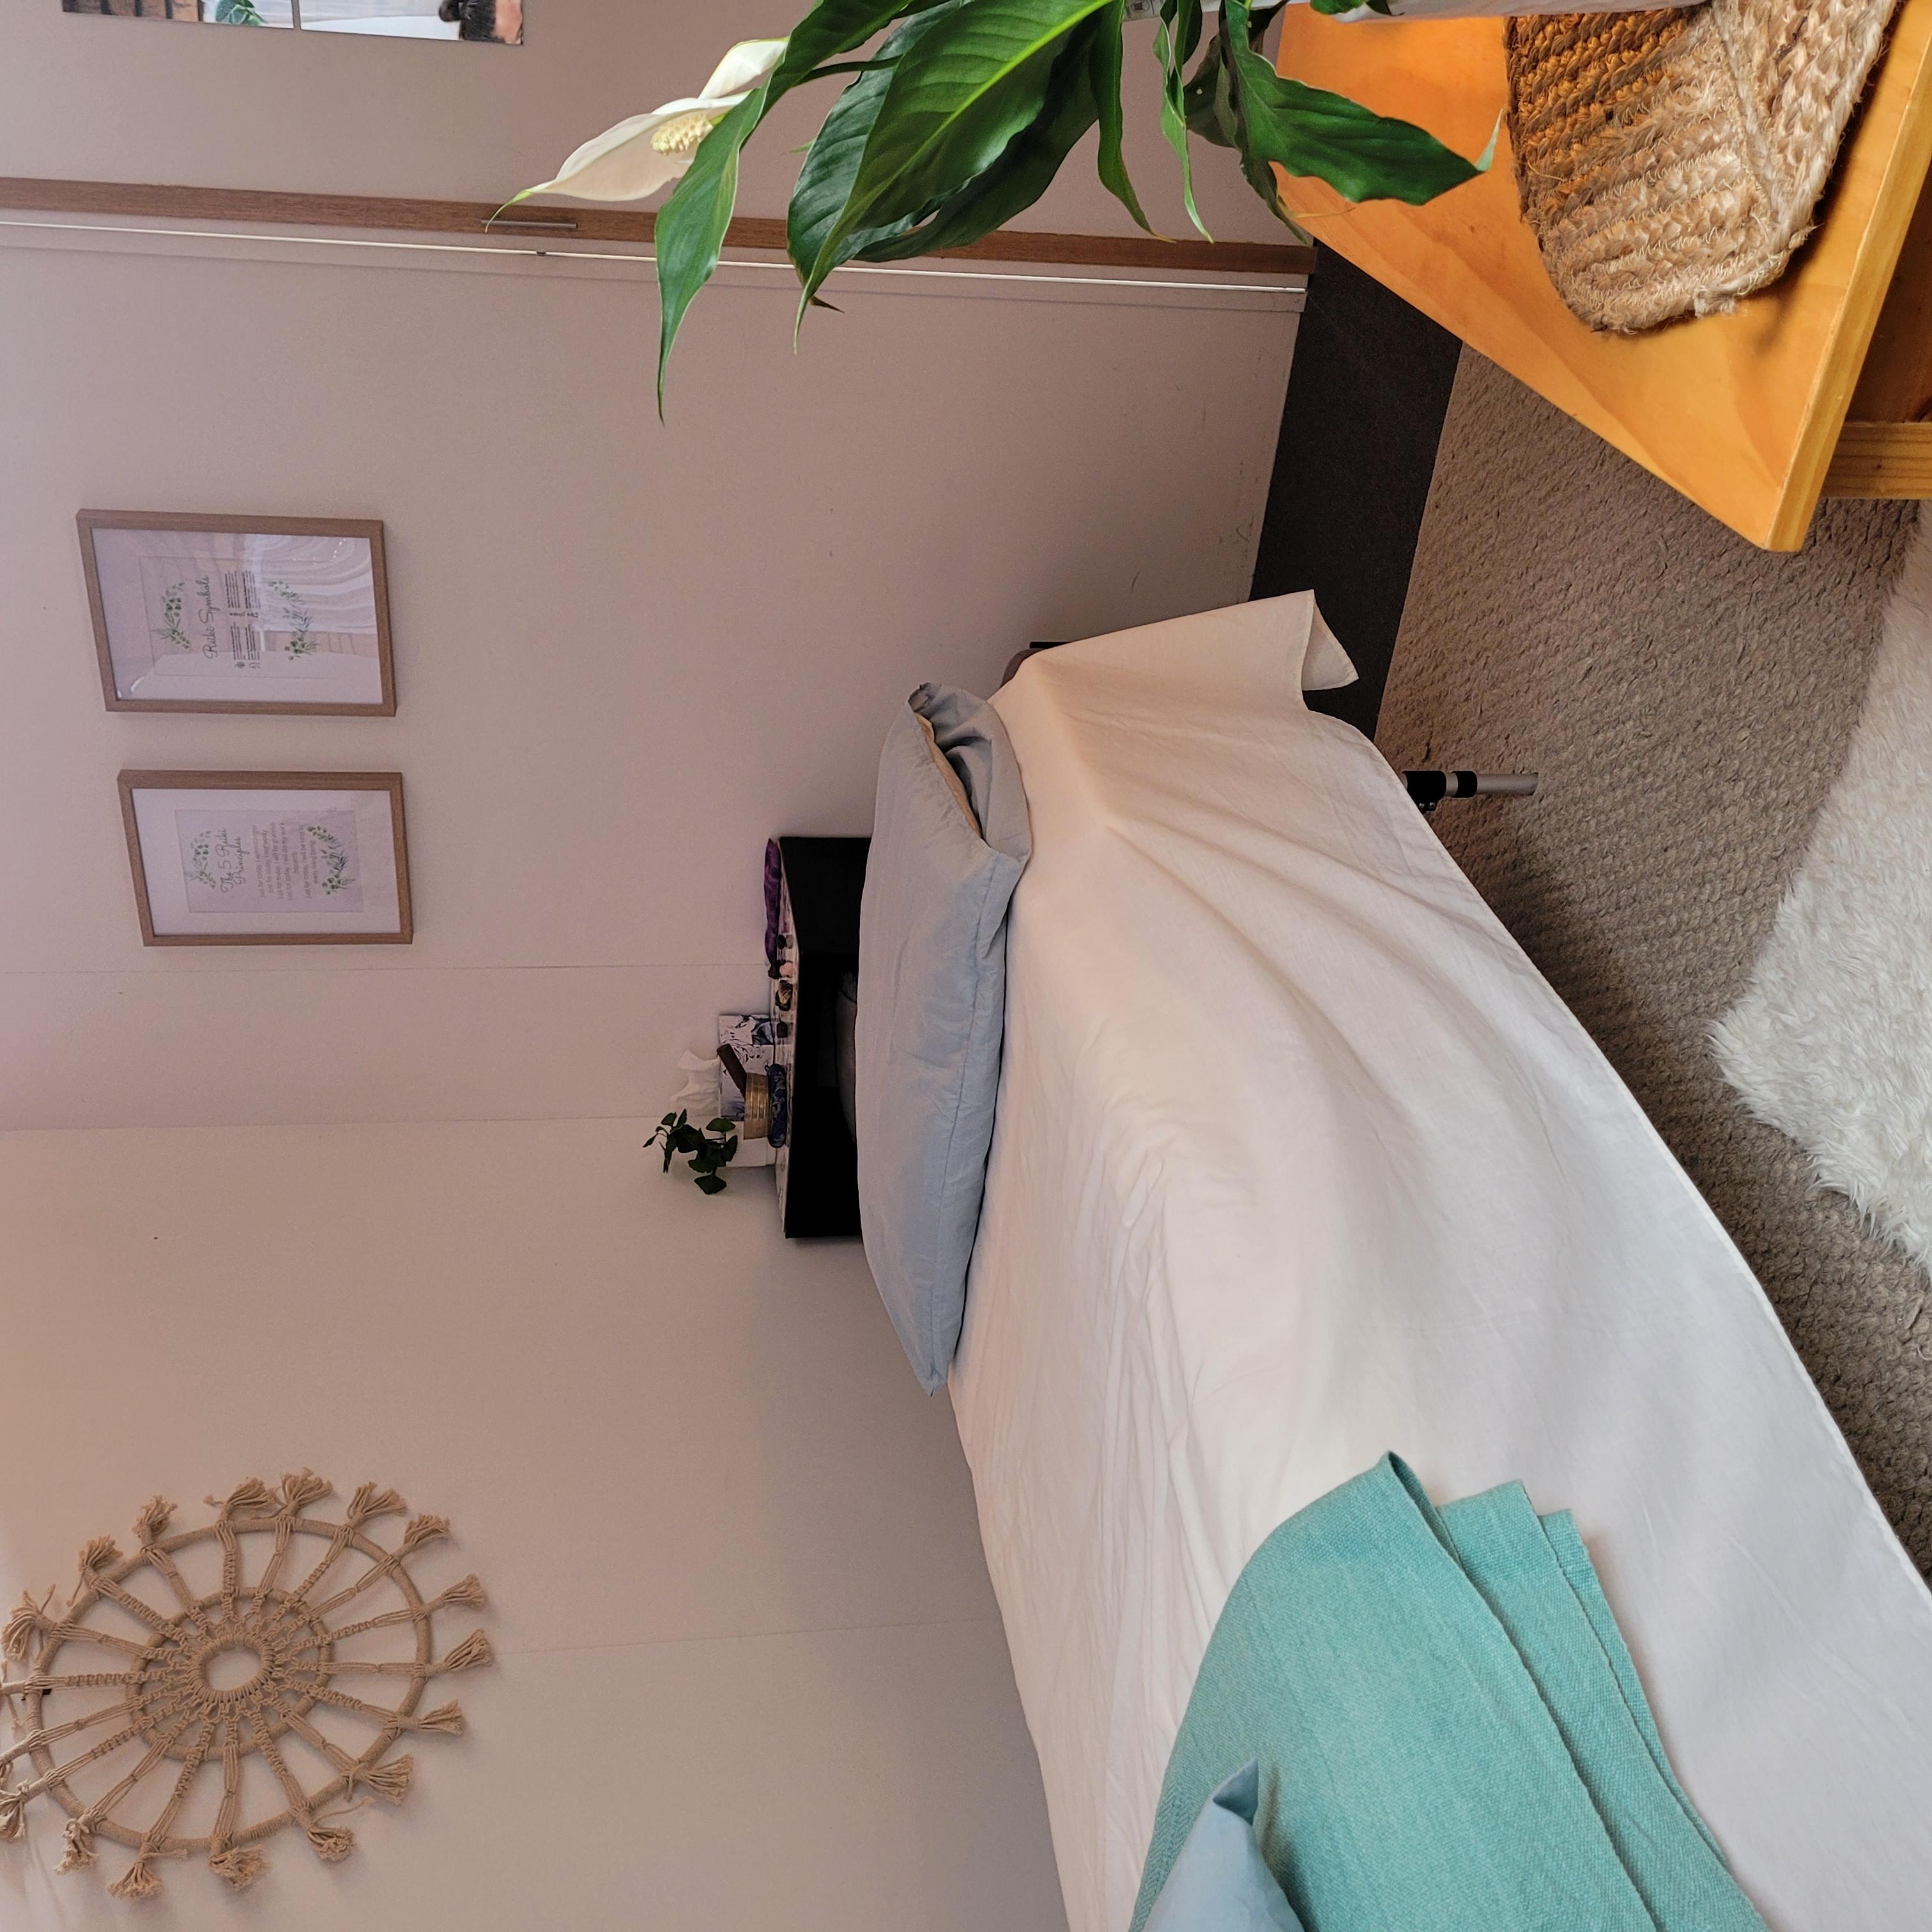 Reiki room pic 3.jpg